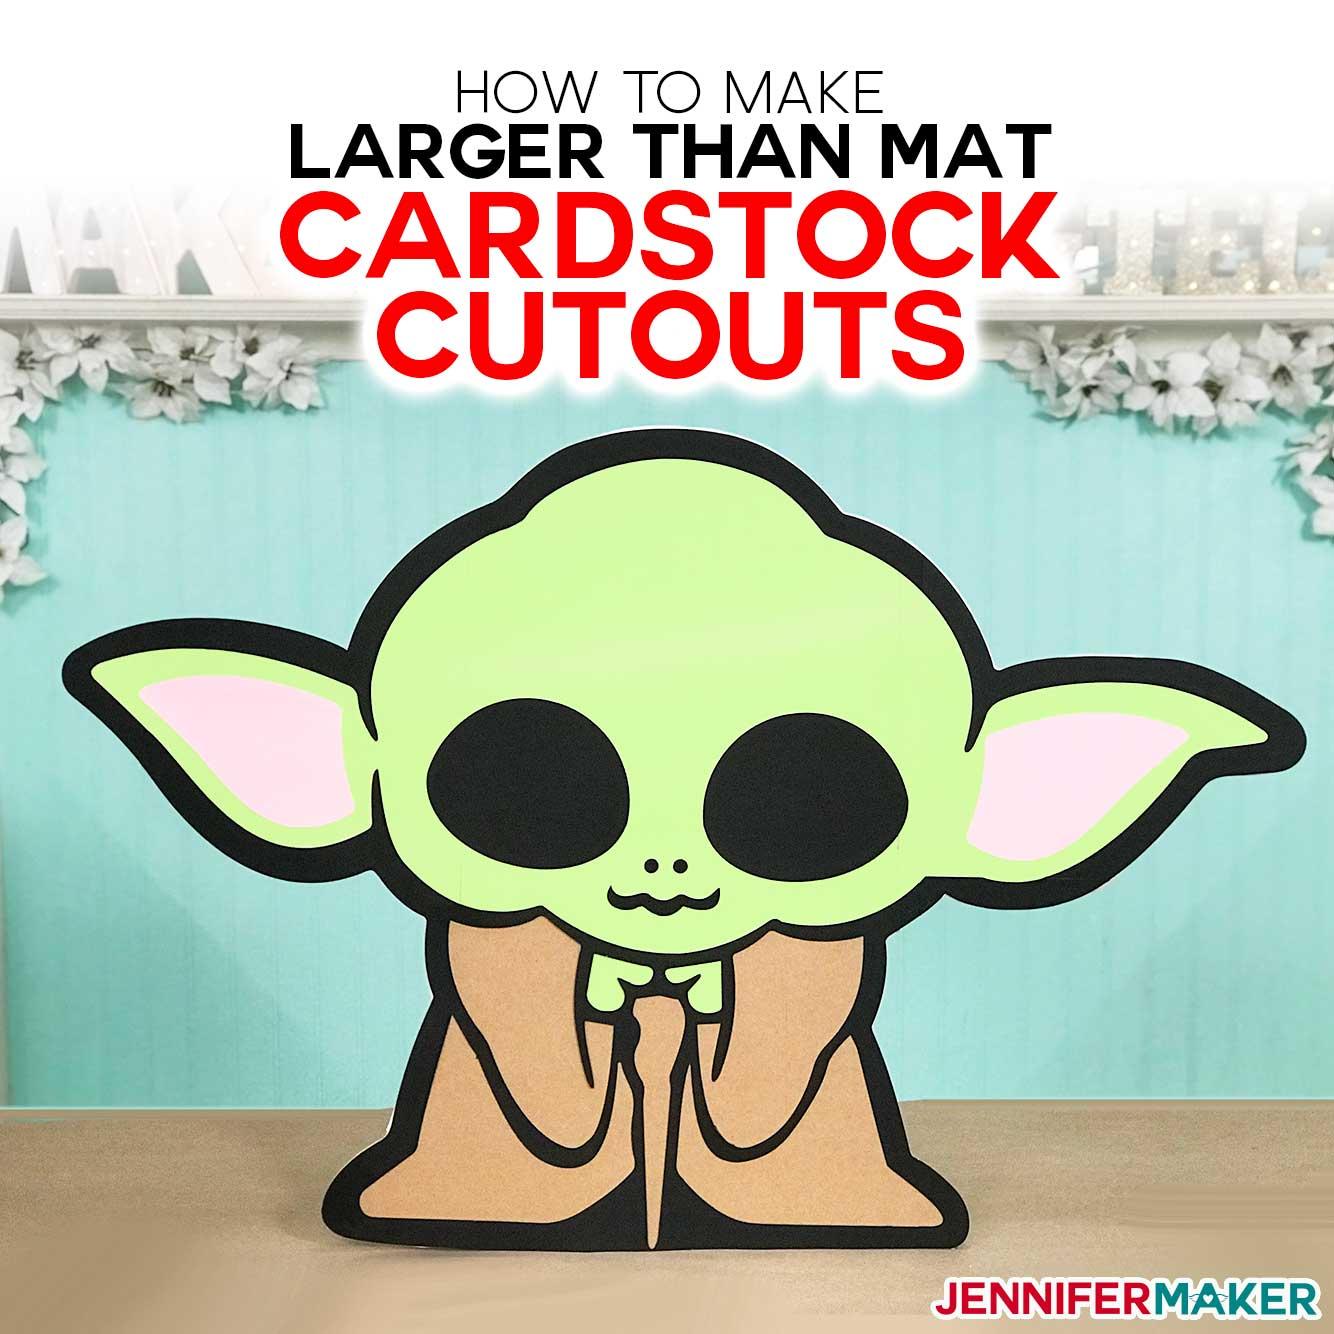 "Make Cardstock Cutouts Larger Than 12"" x 24"" Mat on a Cricut and make Baby Yoda off the mat! #cricut #cricutdesignspace #babyyoda"